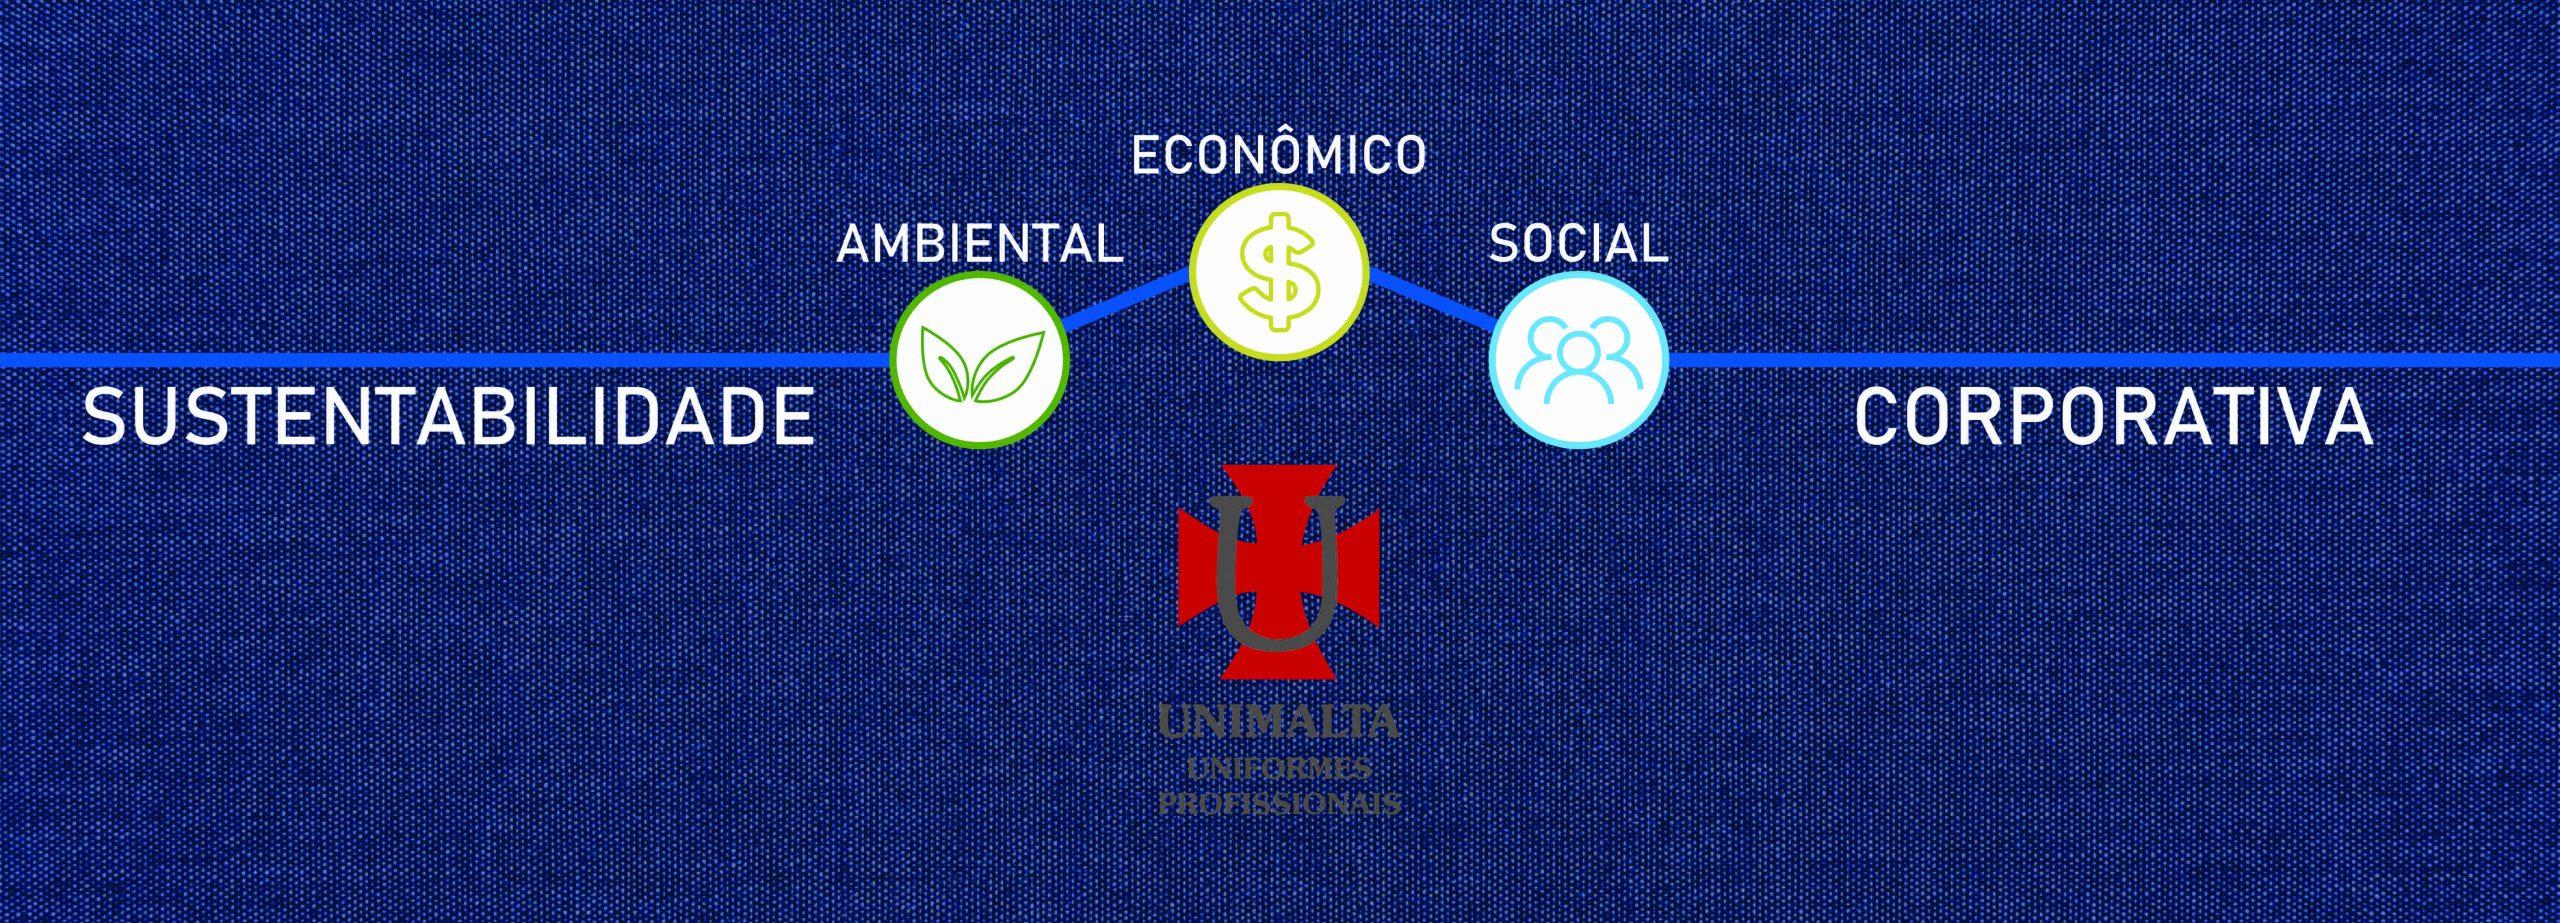 Banner Corporativa